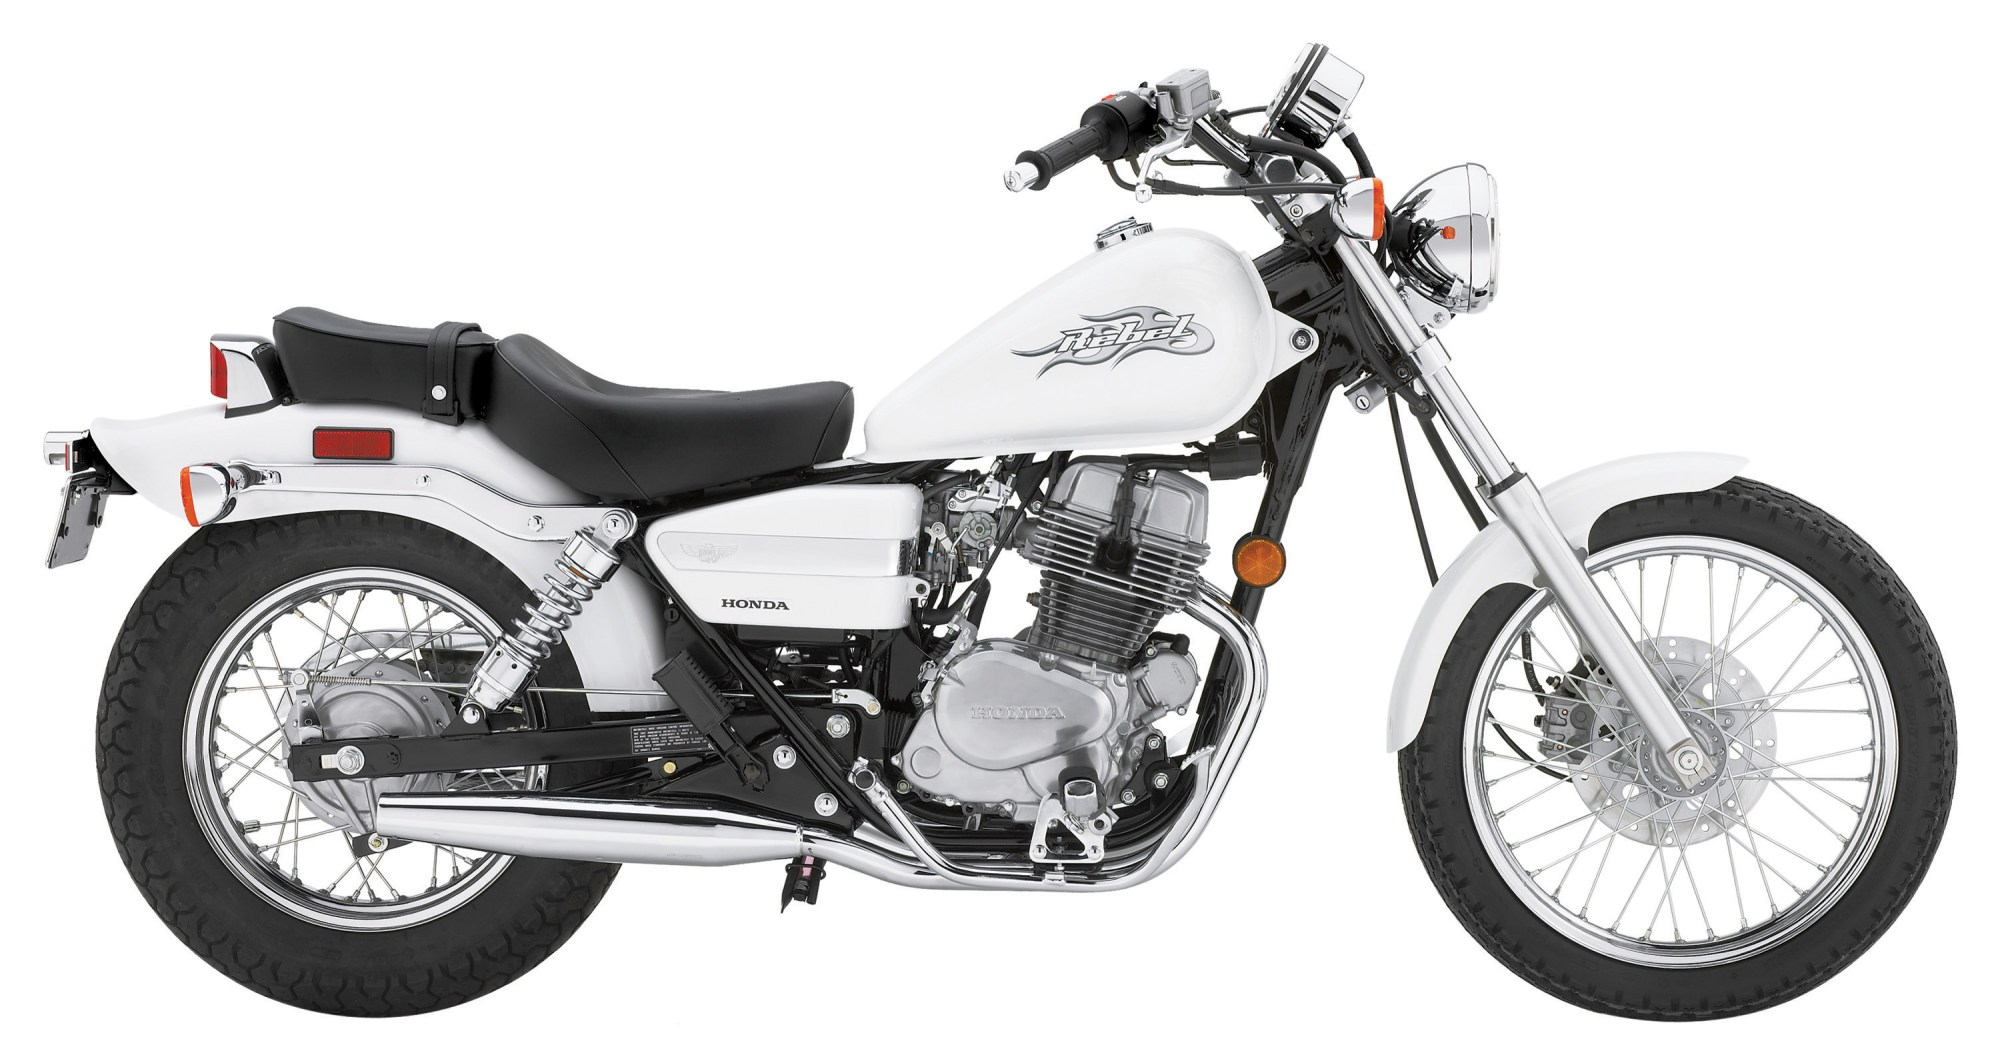 hight resolution of honda rebel 250 engine schematic